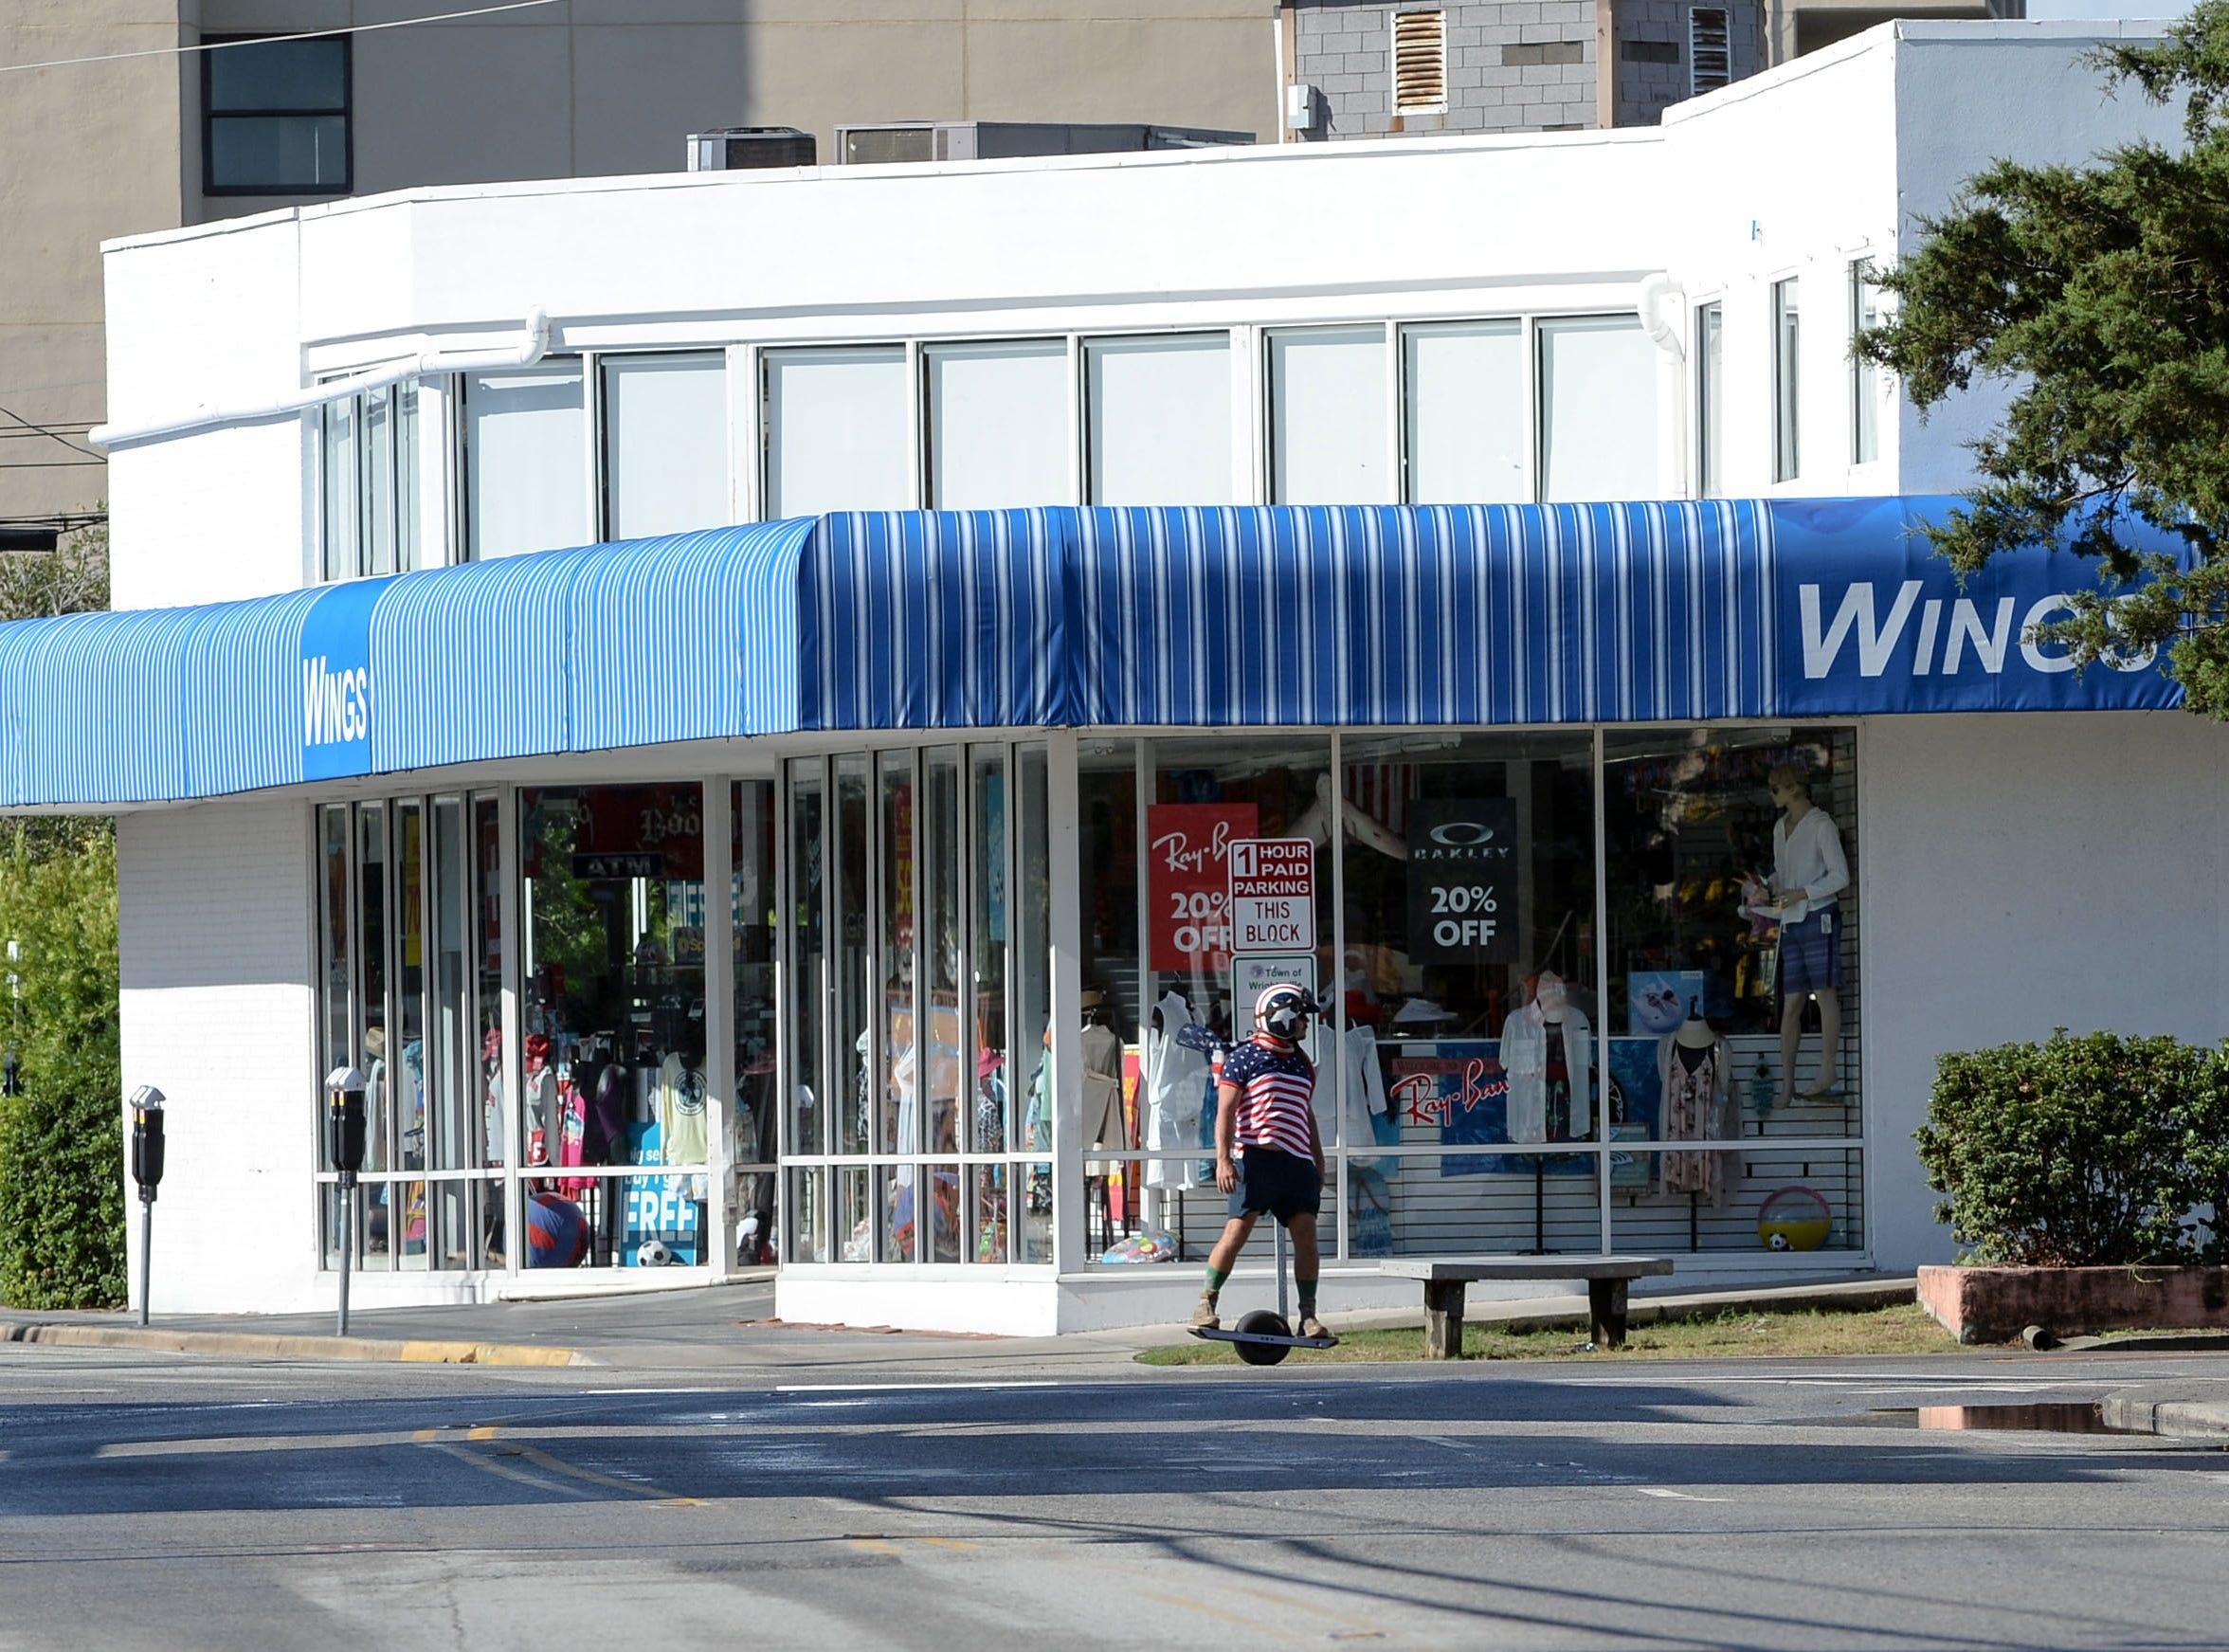 A man skates near a Wing's store at Wrigtsville Beach in Wilmington, North Carolina on Wednesday, September 12, 2018.  (Ken Ruinard / Greenville News / Gannett USA Today Network / 2018 )